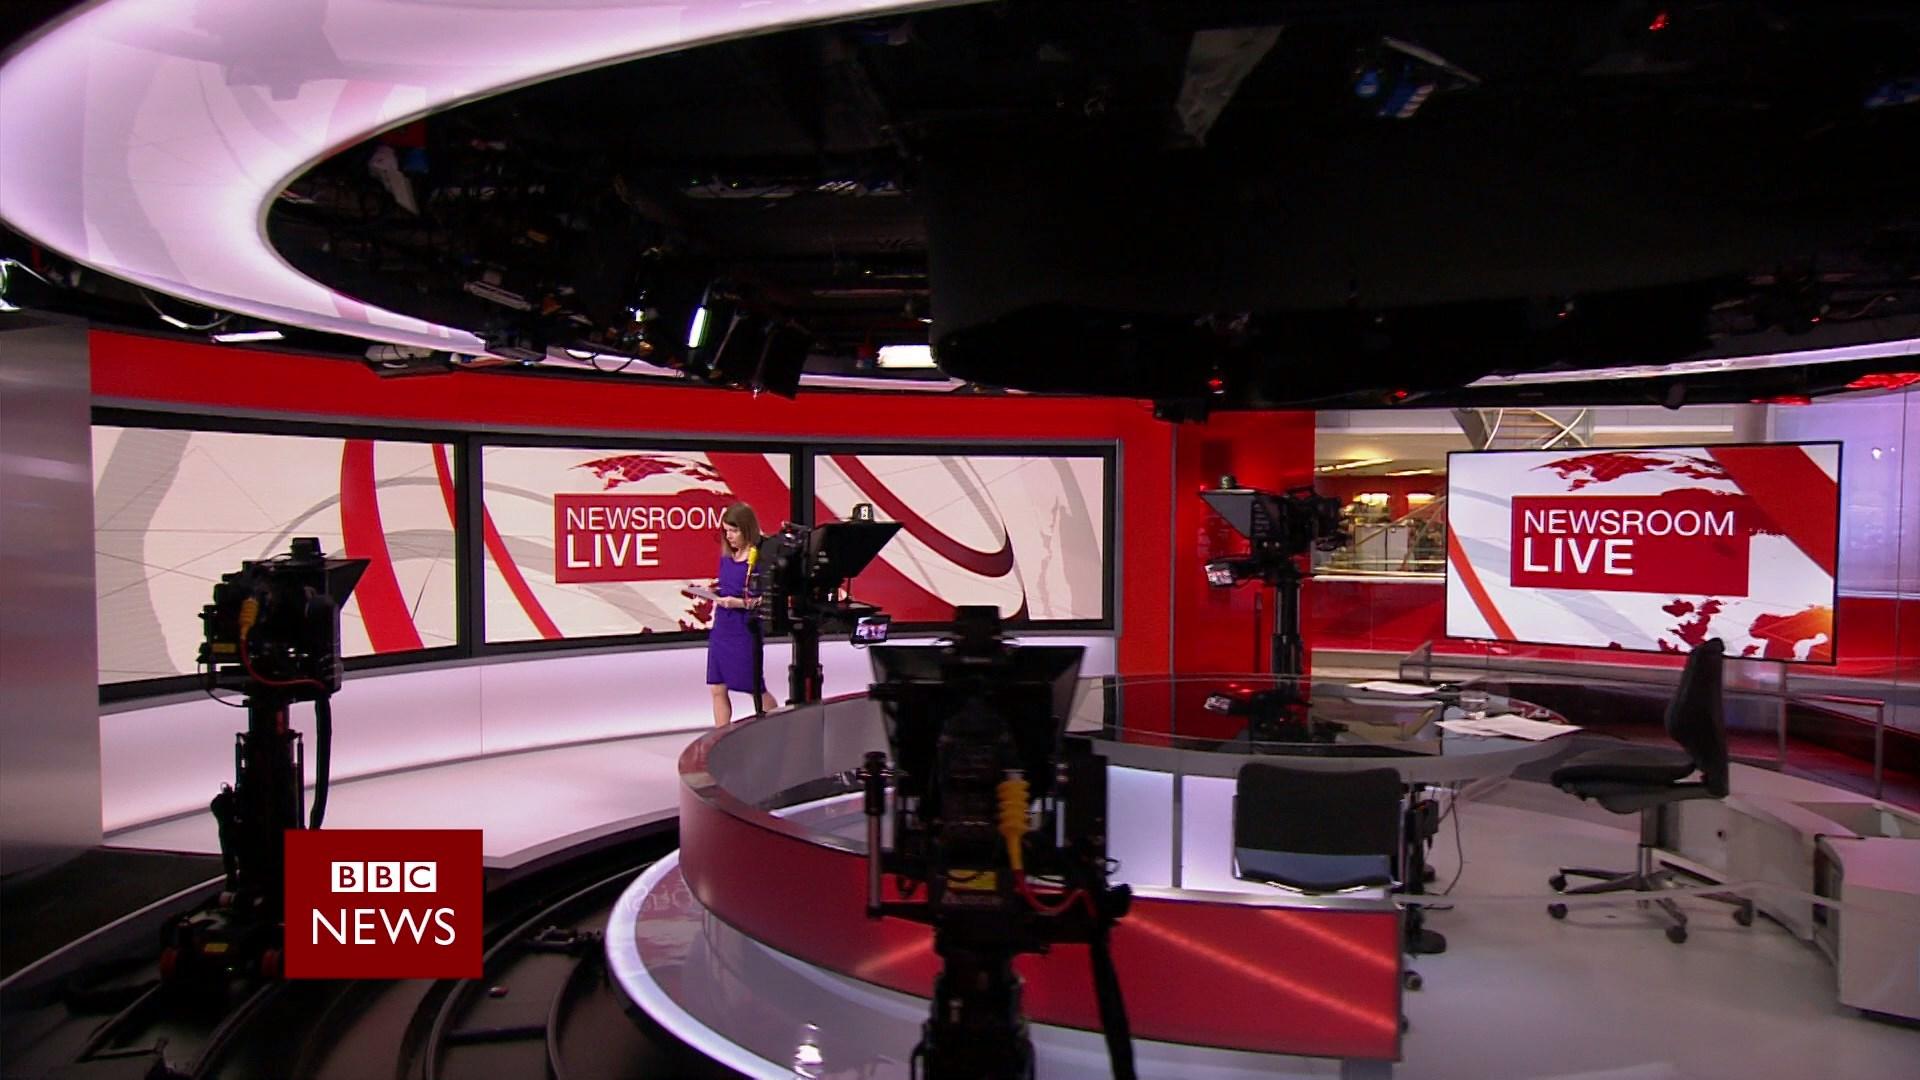 68343647_bbc-newsroom-live_20180416_11001200-ts_snapshot_00-02-24_-2018-04-16_17-07-22.jpg